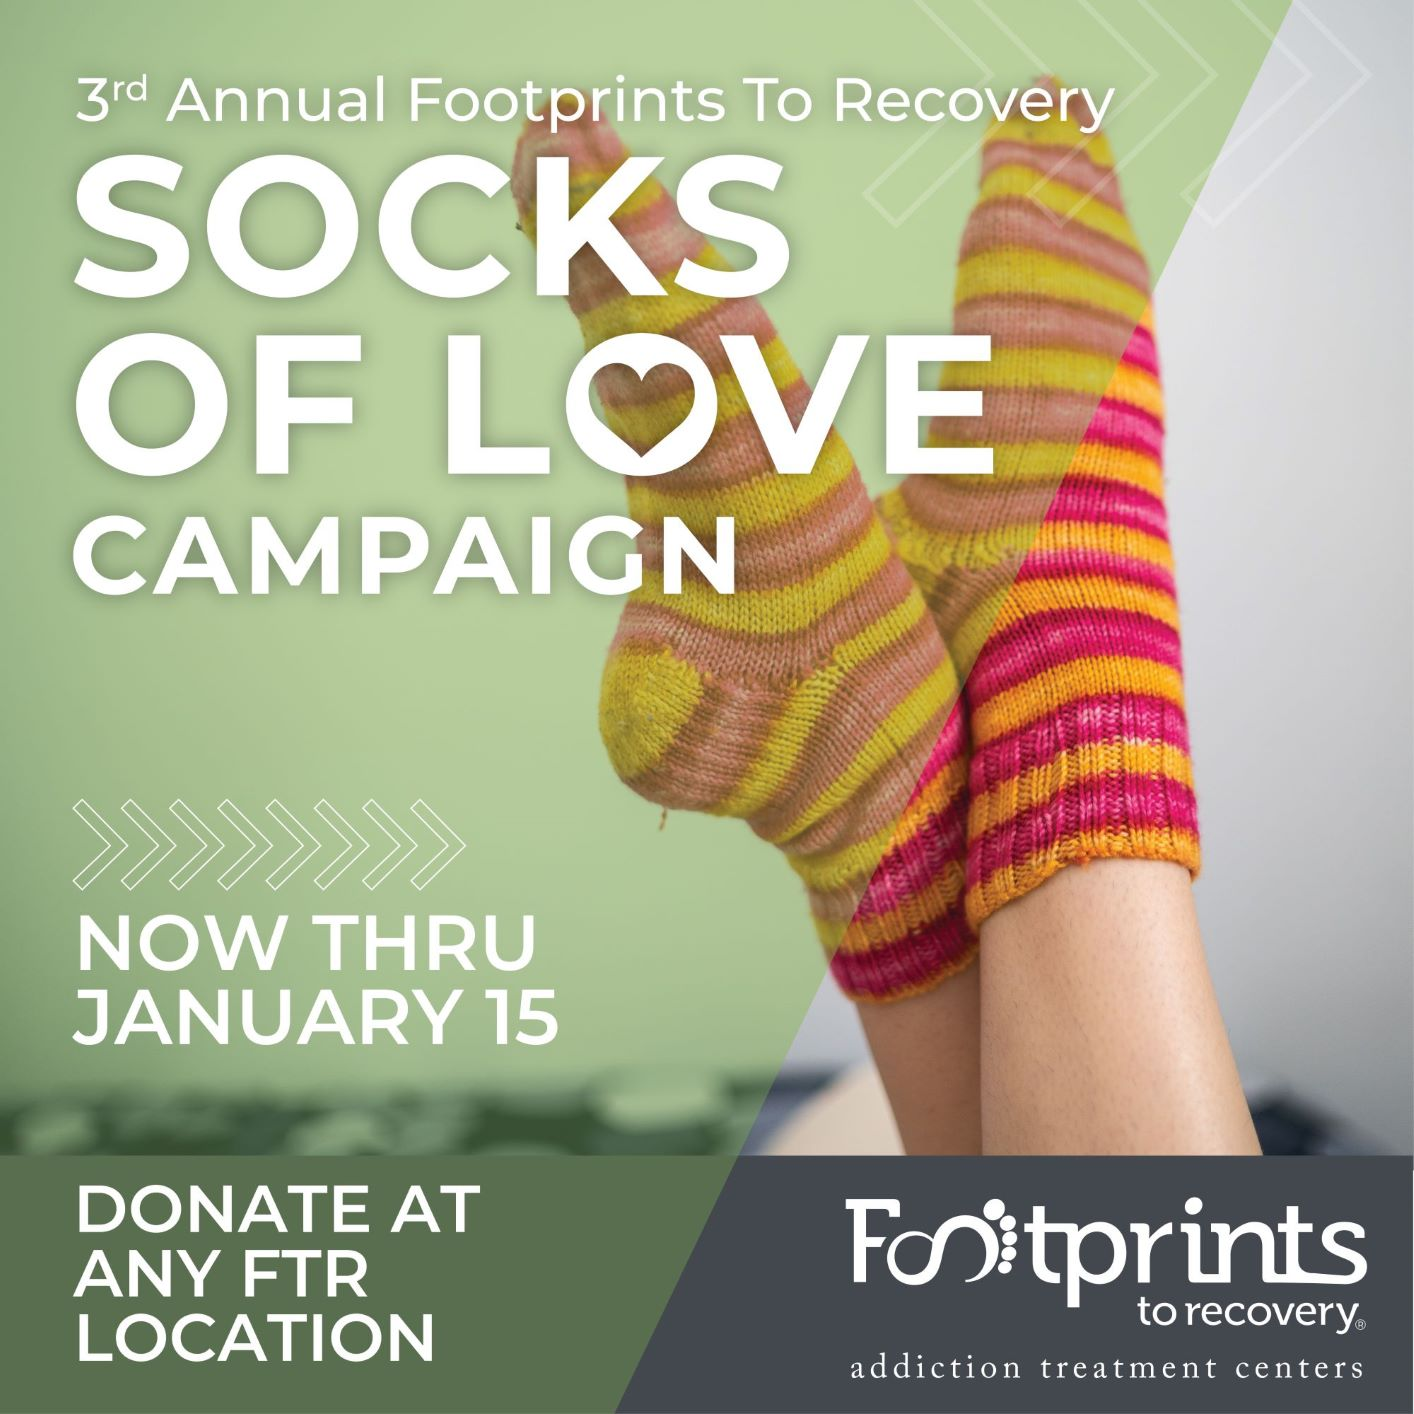 Donate Socks to Help Those Less Fortunate